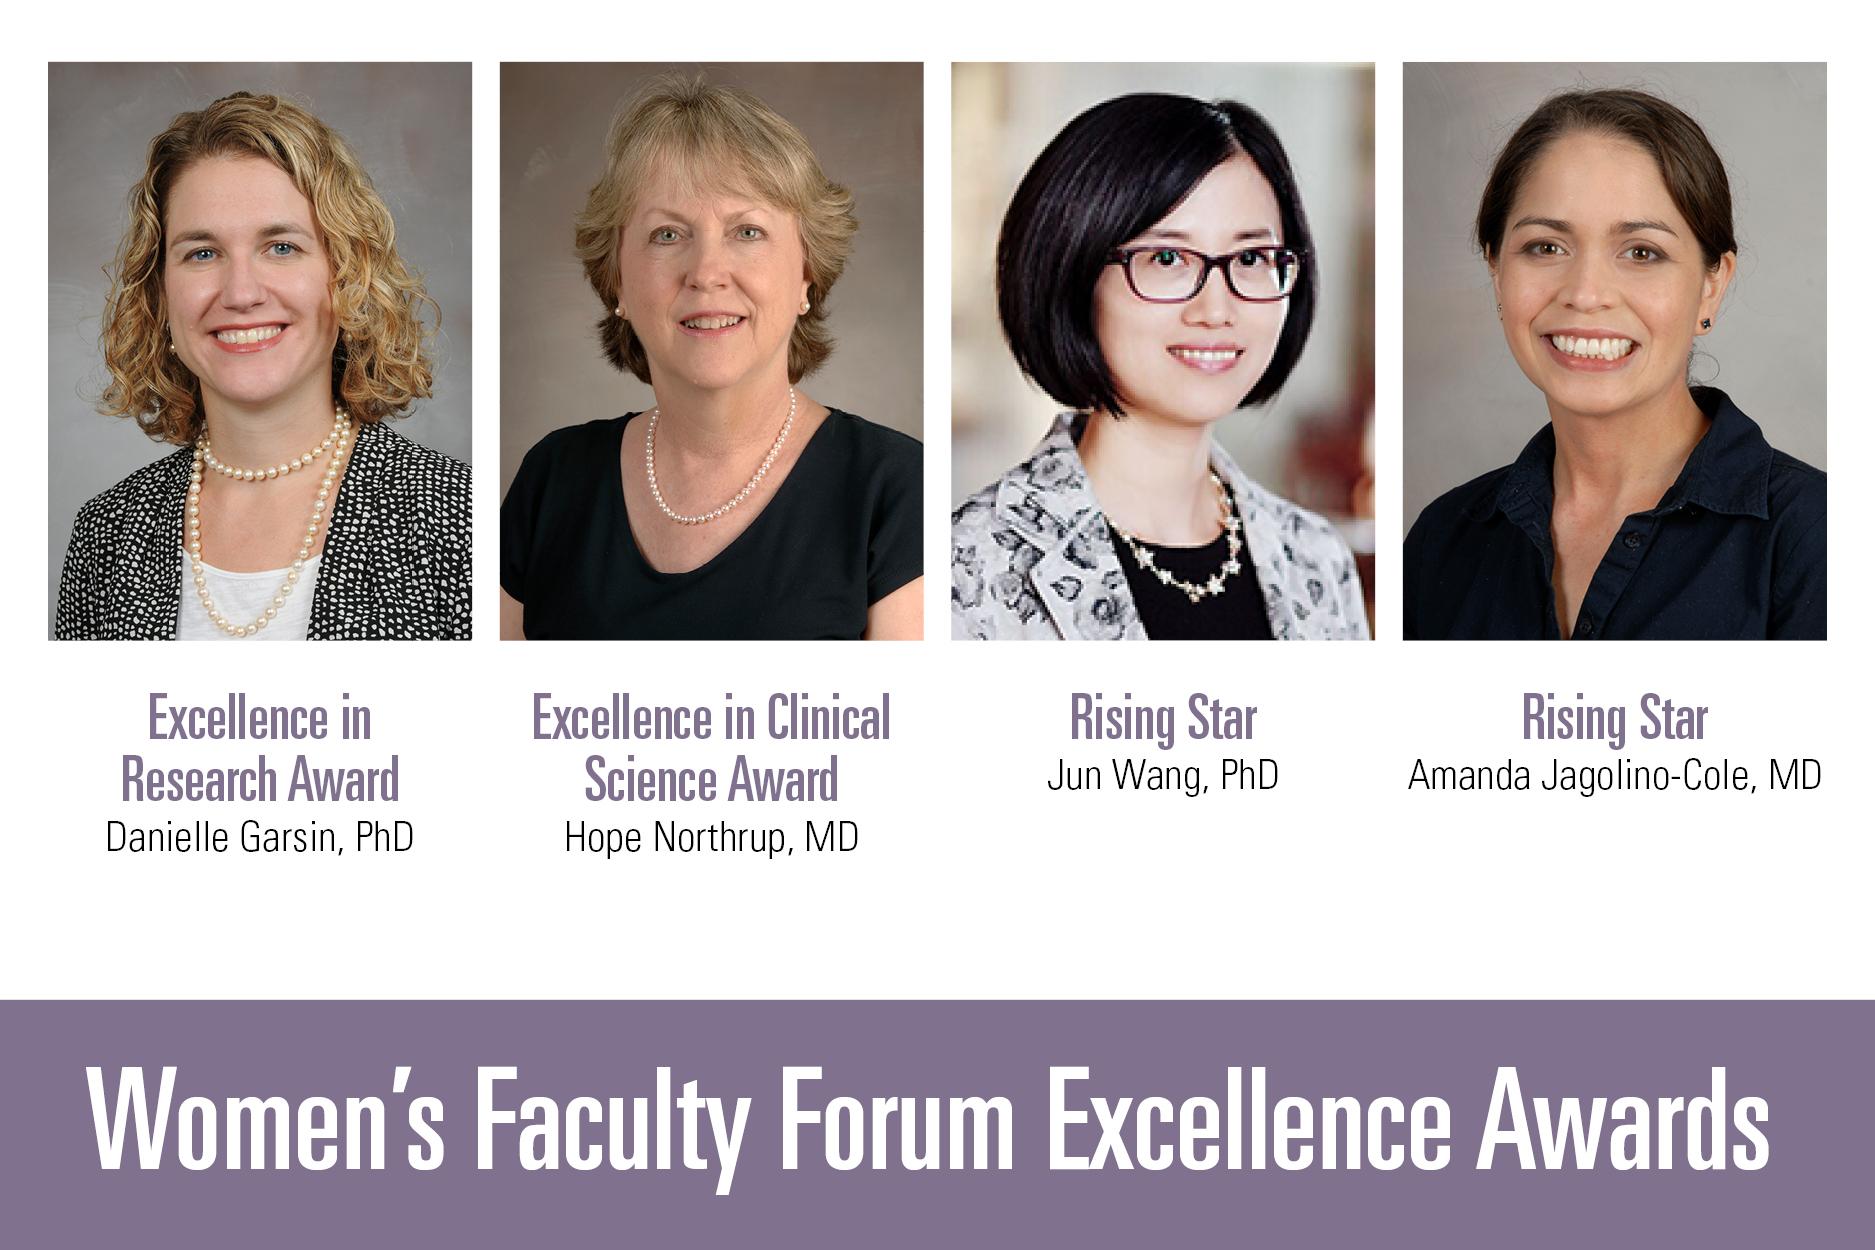 Women's Faculty Forum Excellence Awards